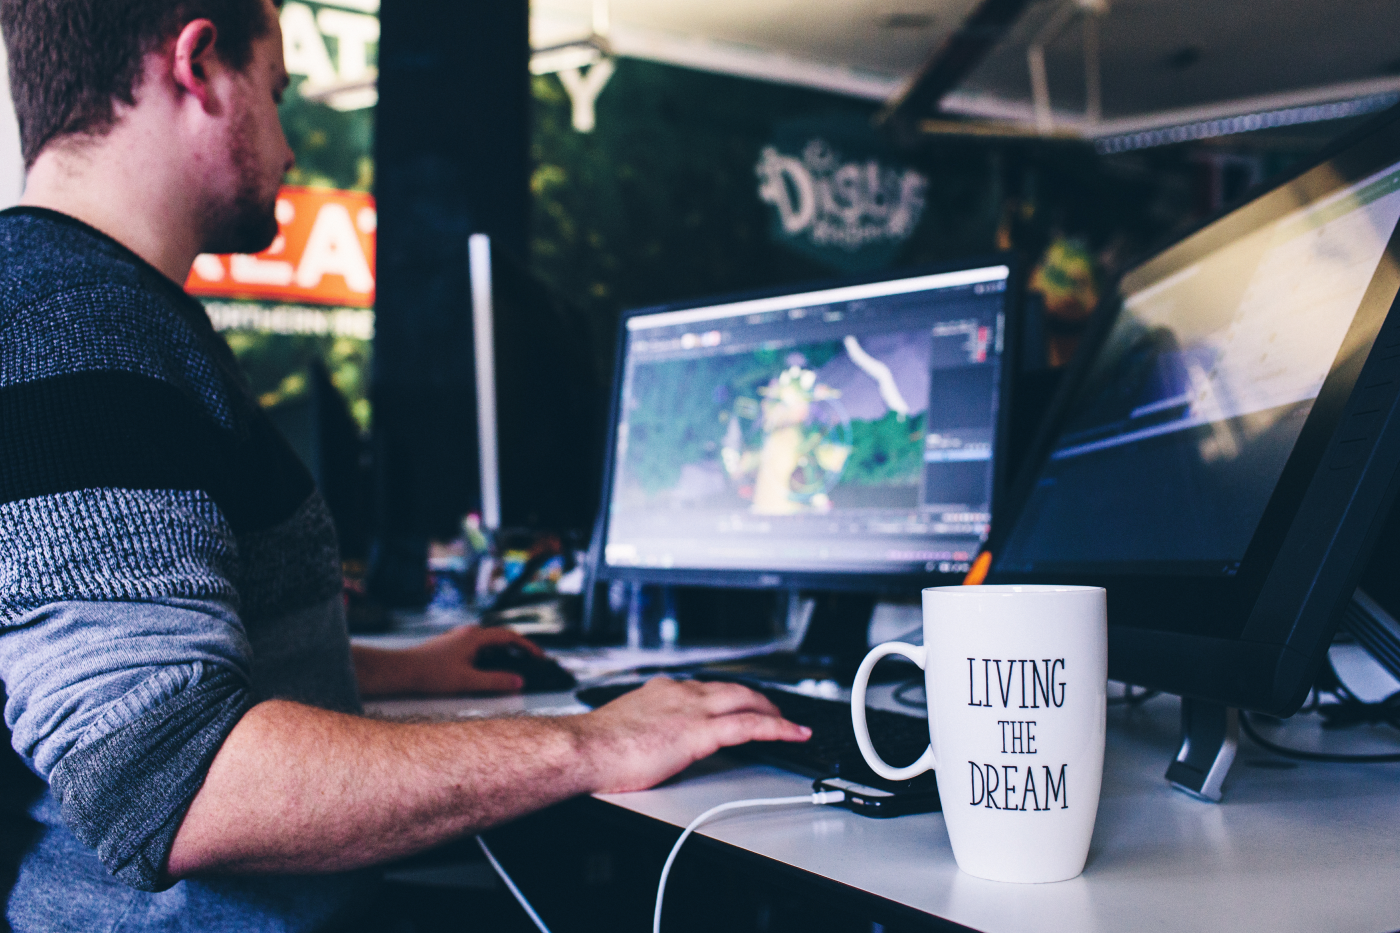 White male animator working at a desk in a creative studio